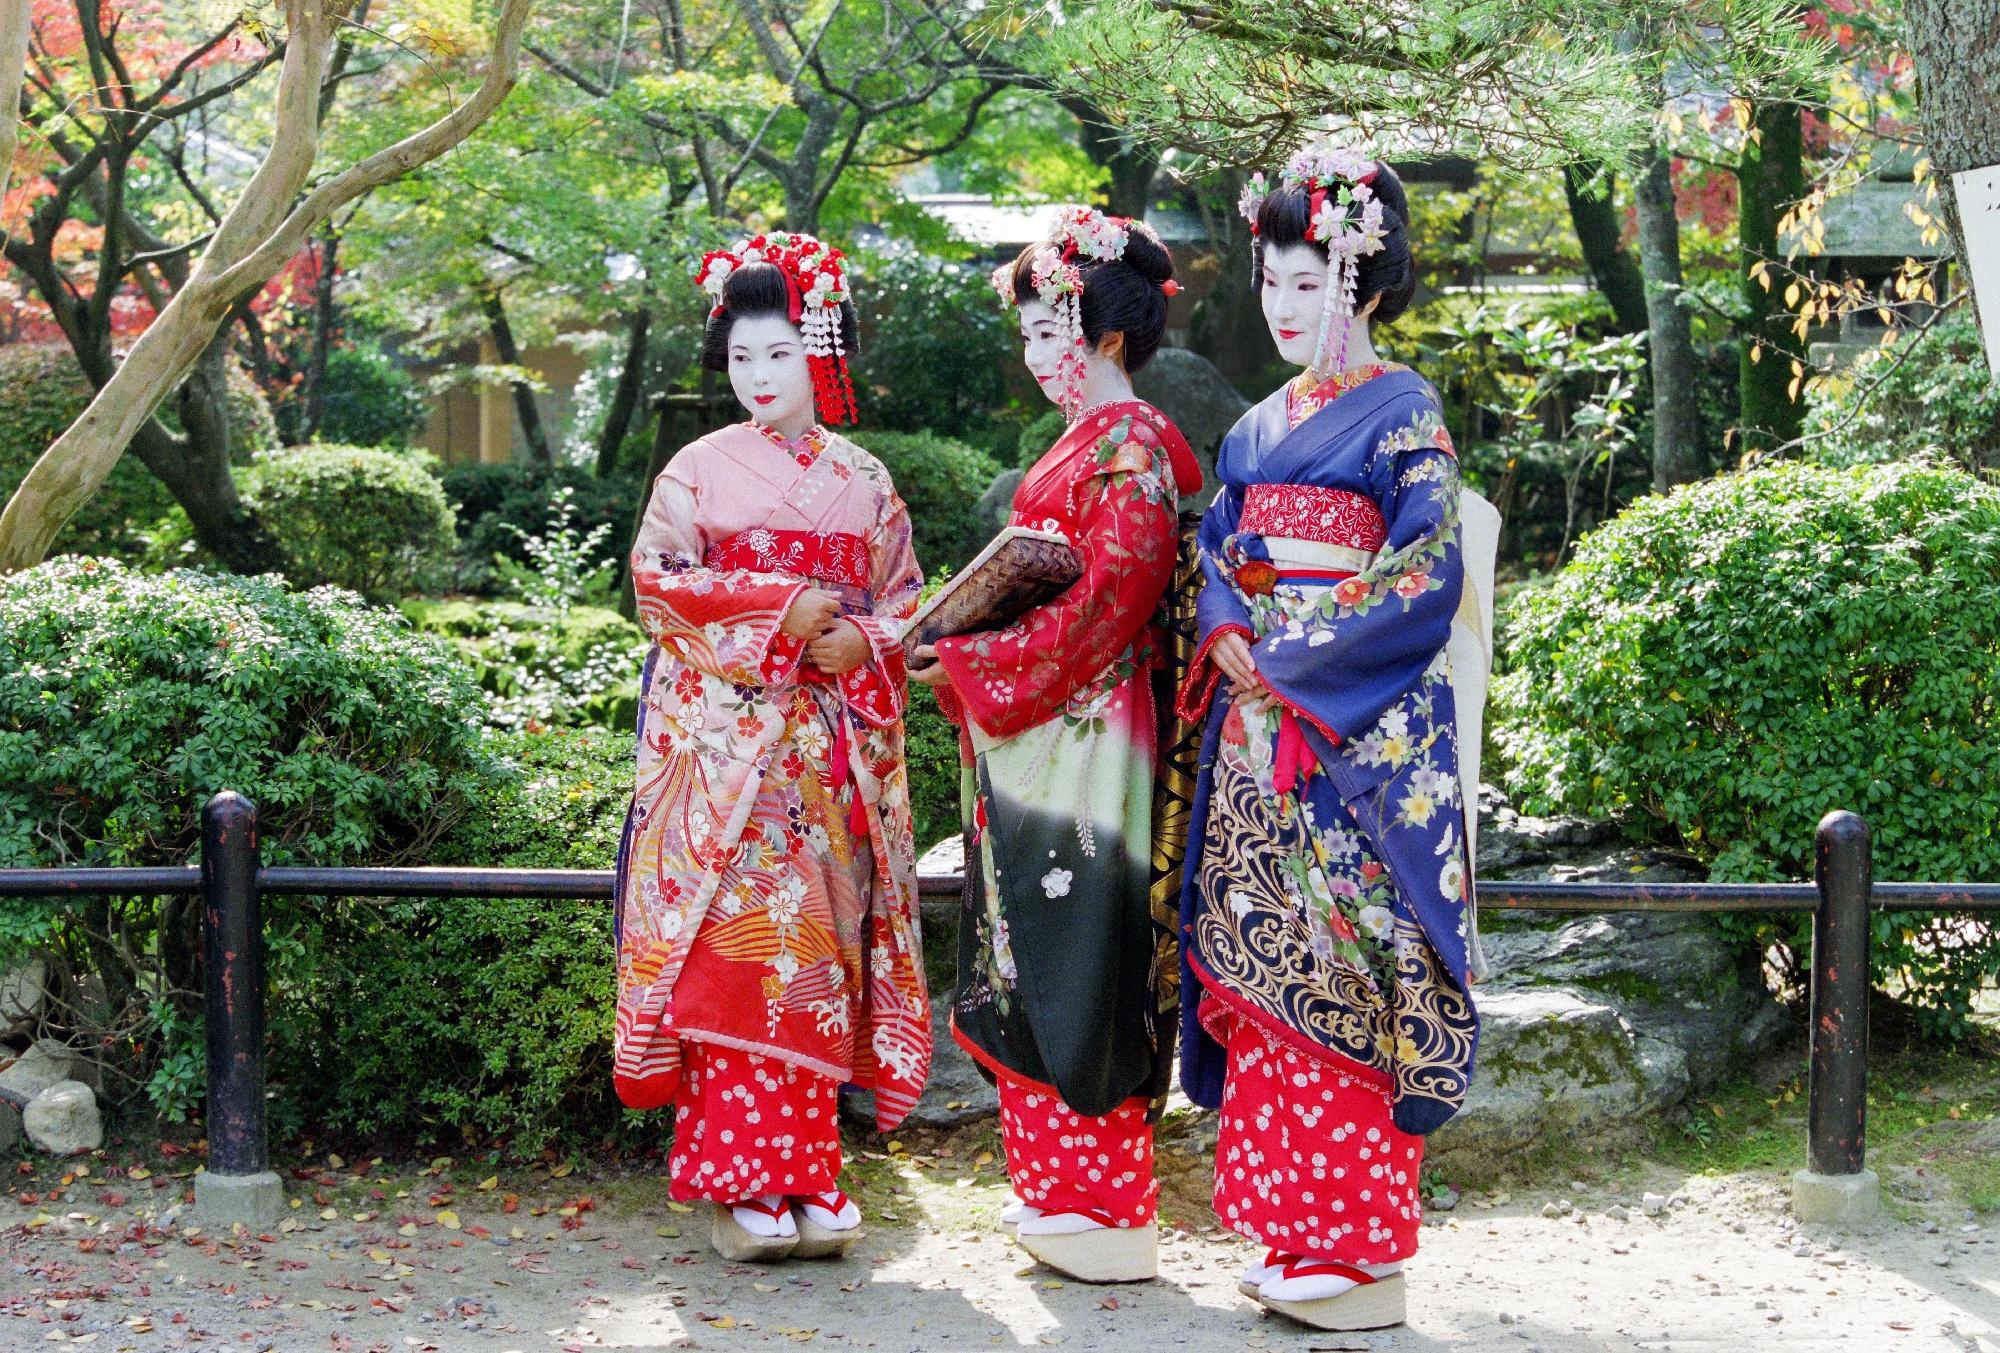 women wearing traditional kimonos and geisha makeup